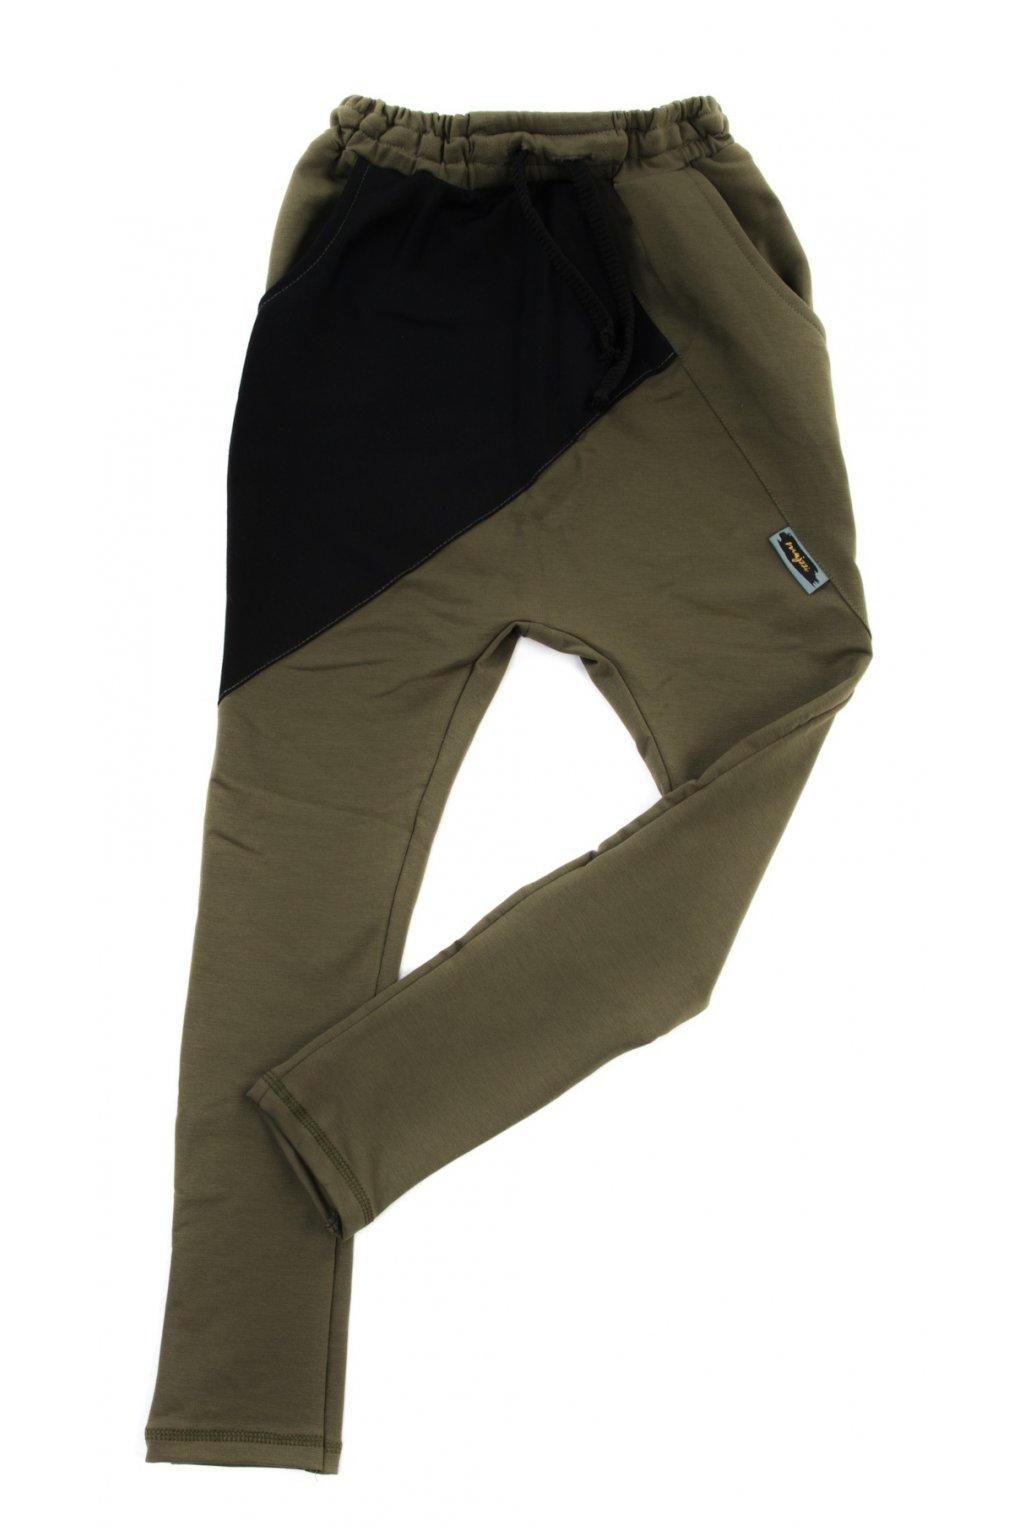 Kalhoty Khaki/černá